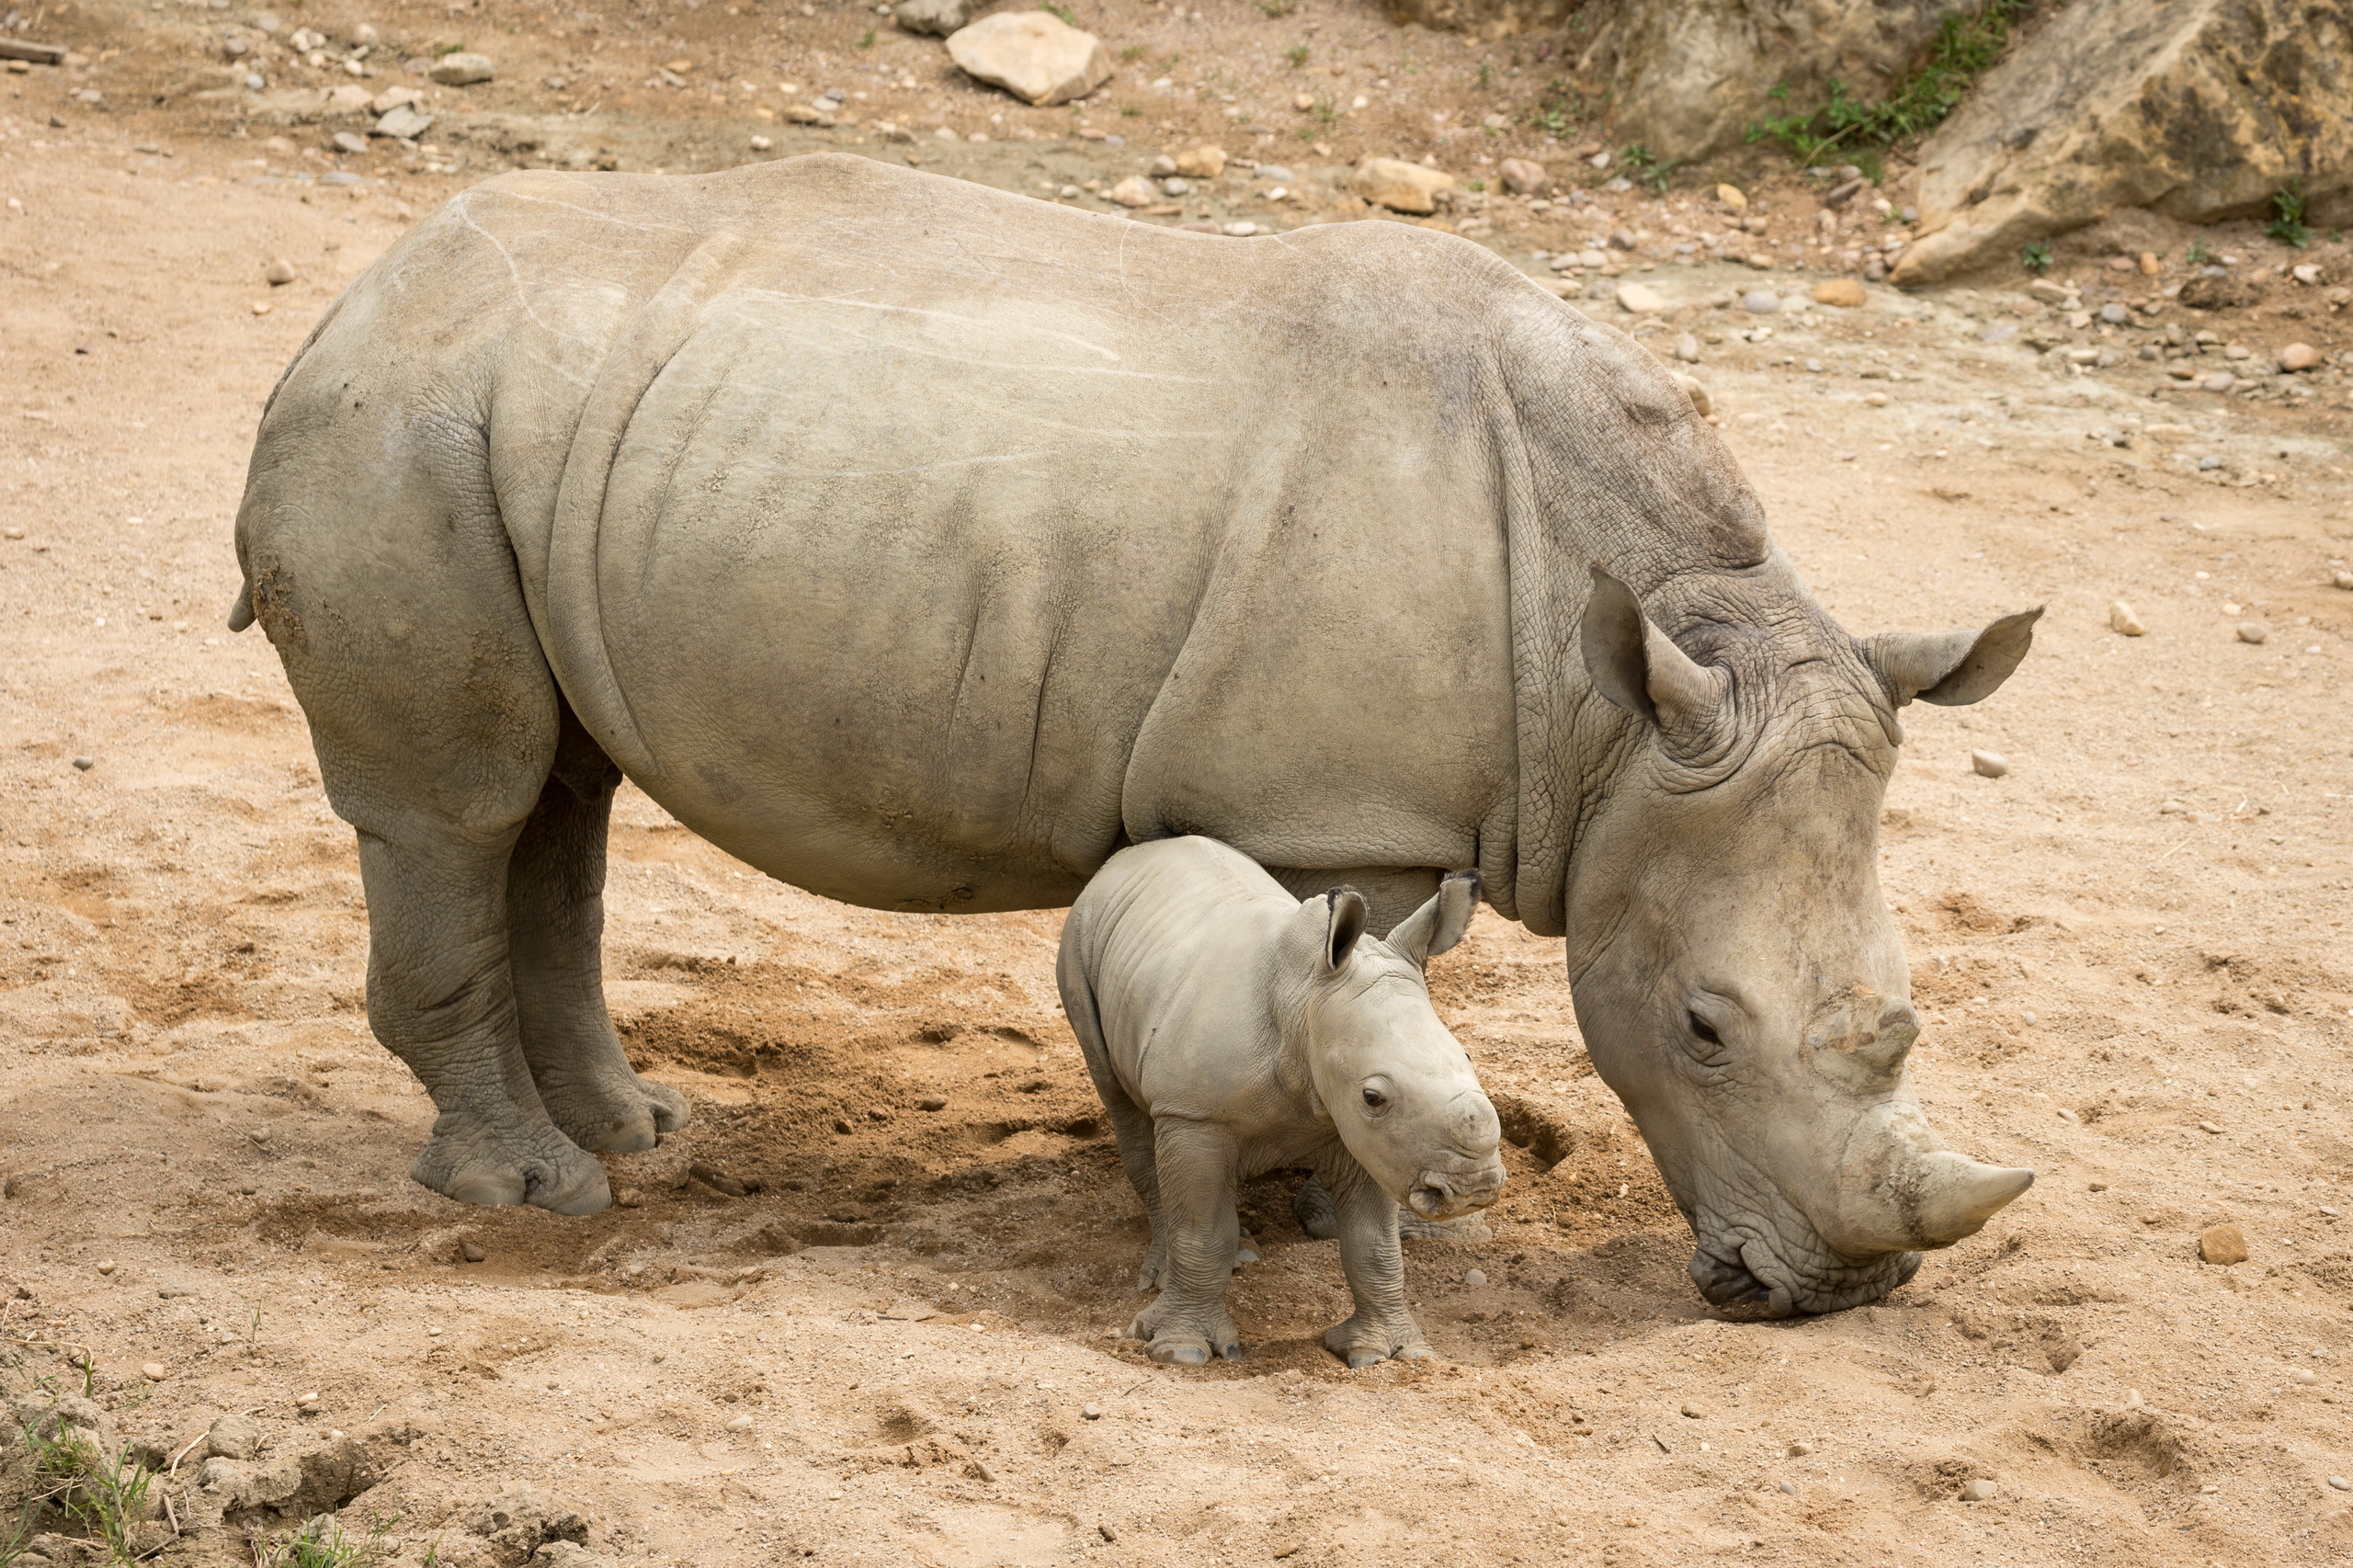 rhino hd wallpaper background image 2560x1706 id